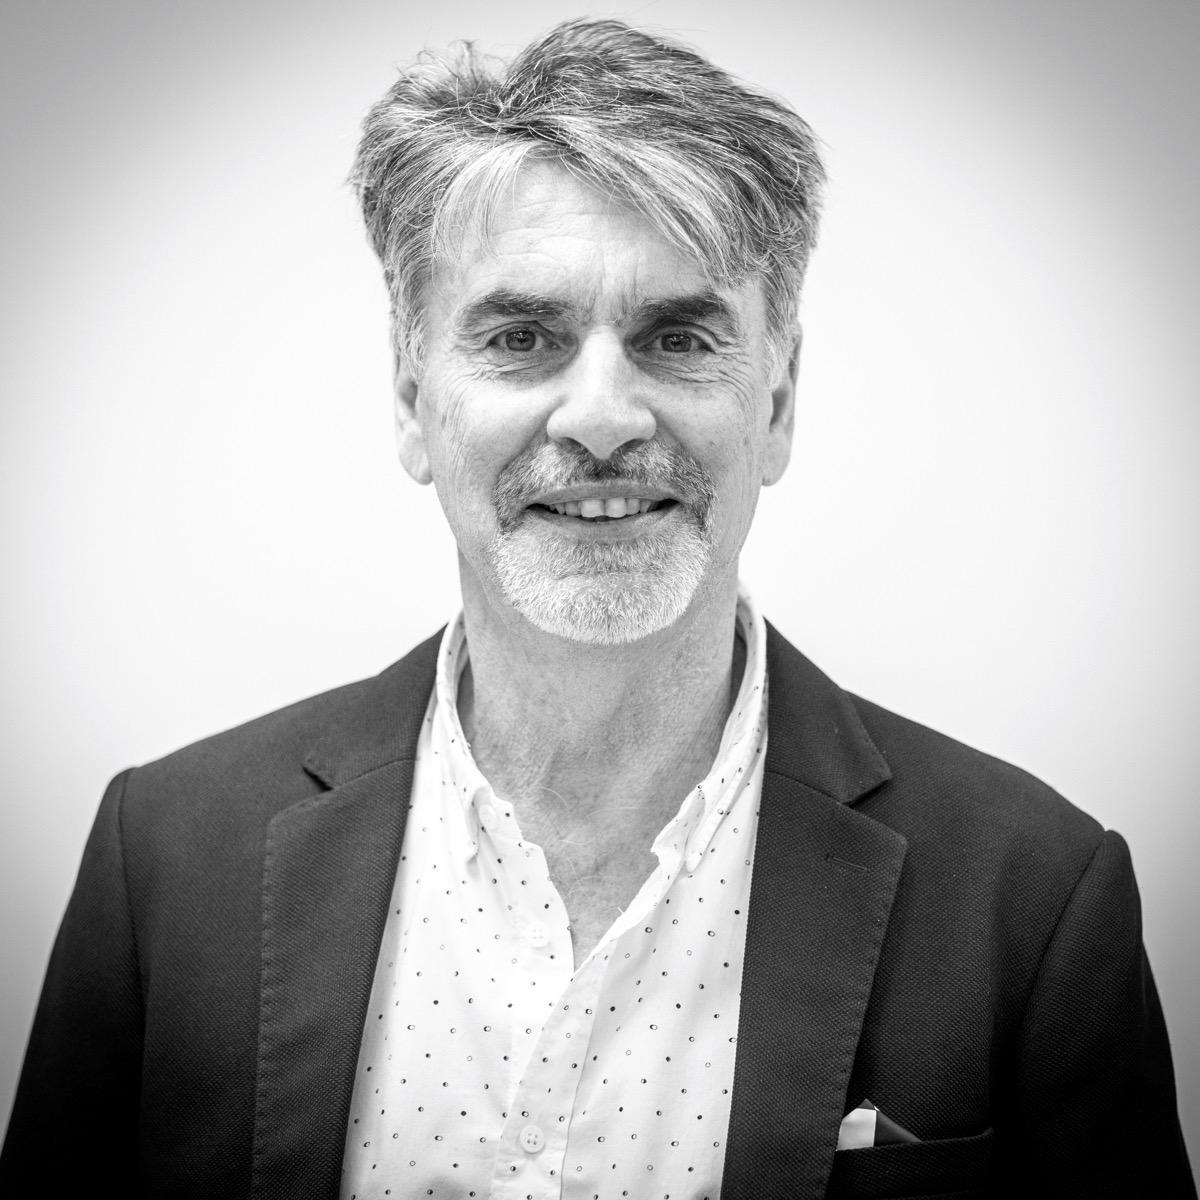 Didier Parienti